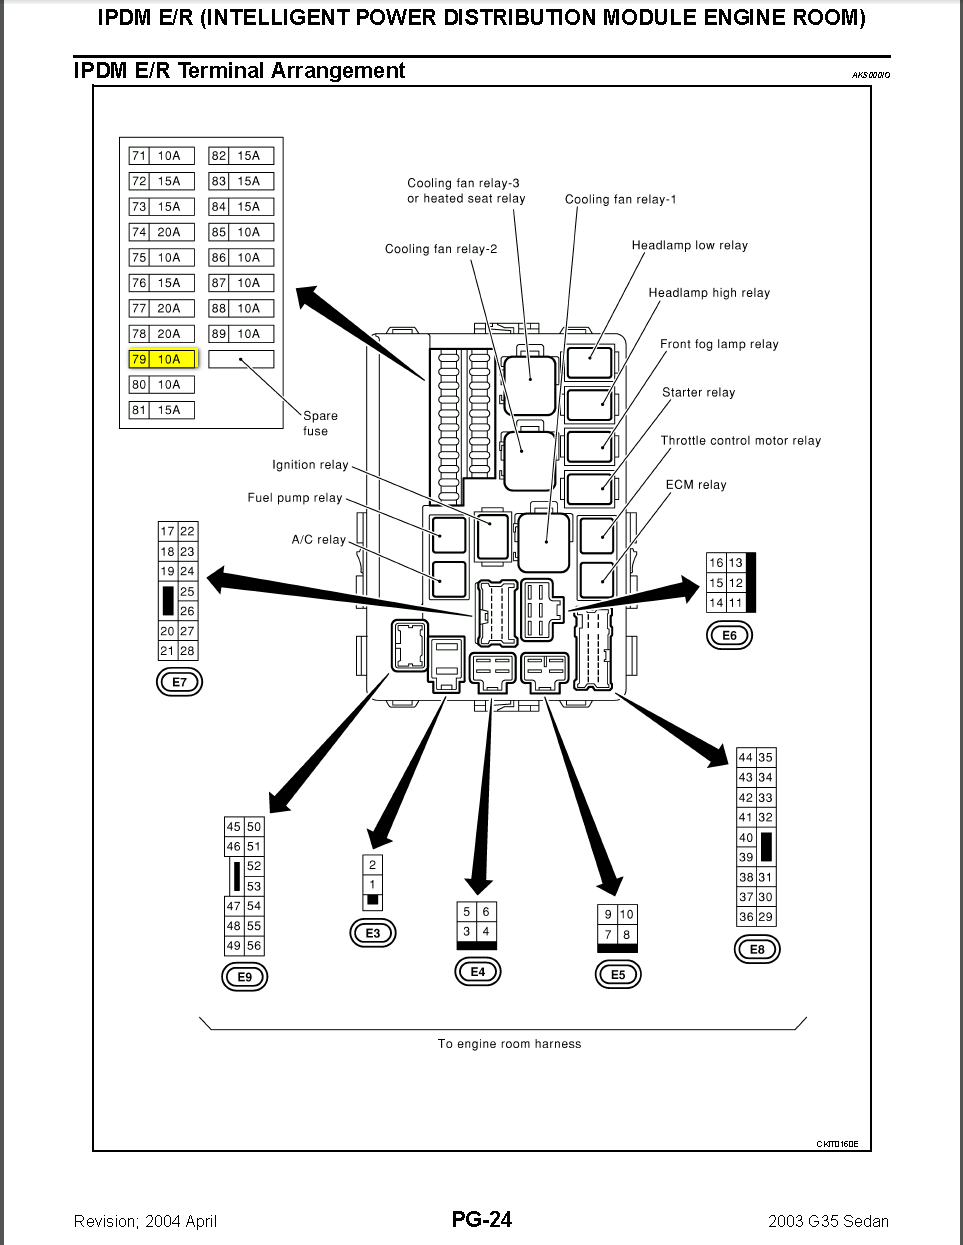 350z Fuse Diagram subaru wrx fuse diagram honda s2000 fuse ... V Fuse Box Translation on